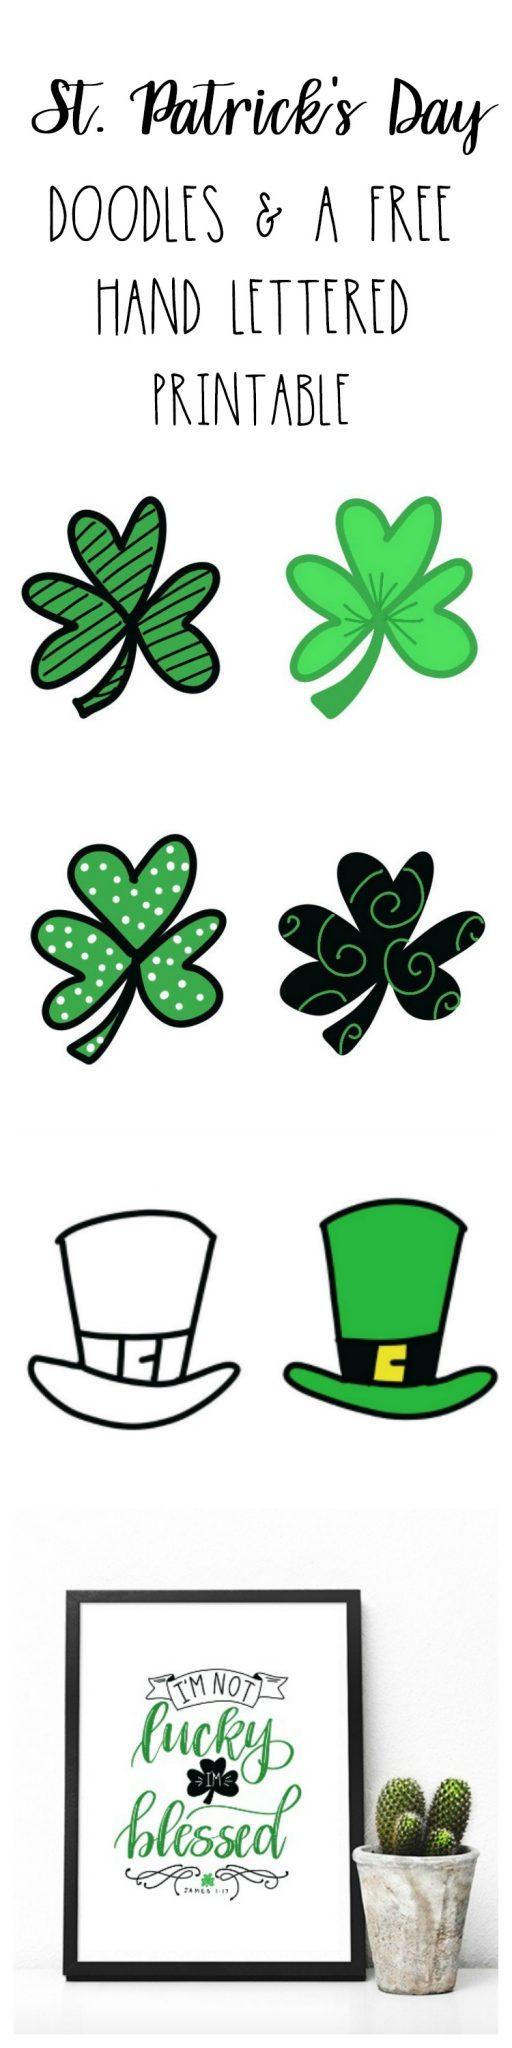 St. Patrick's Day Doodles & Printable